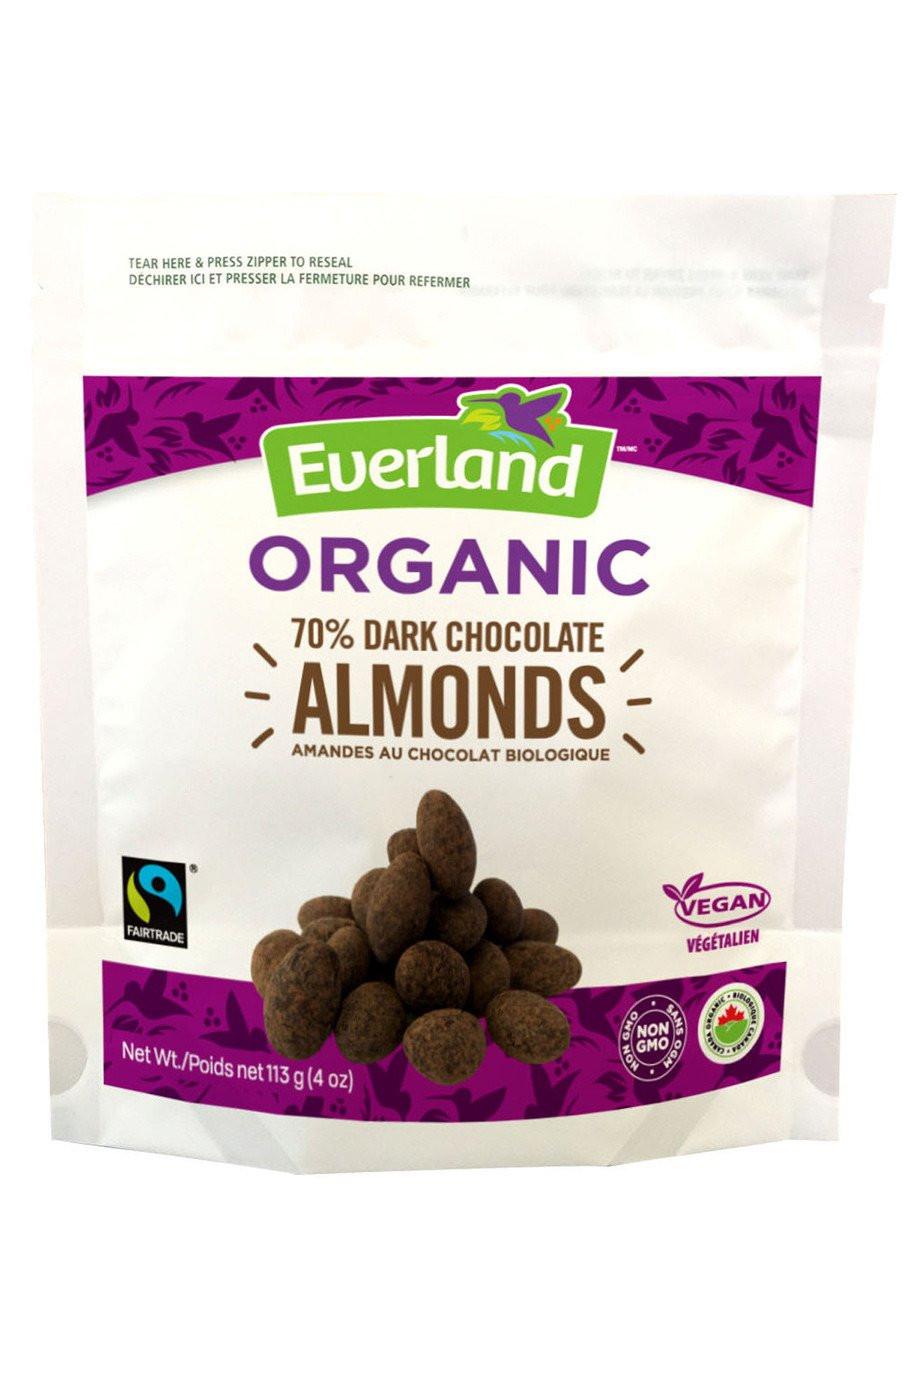 Healthy Chocolate Snacks To Buy  Buy Organic Dark Chocolate Almonds Vegan